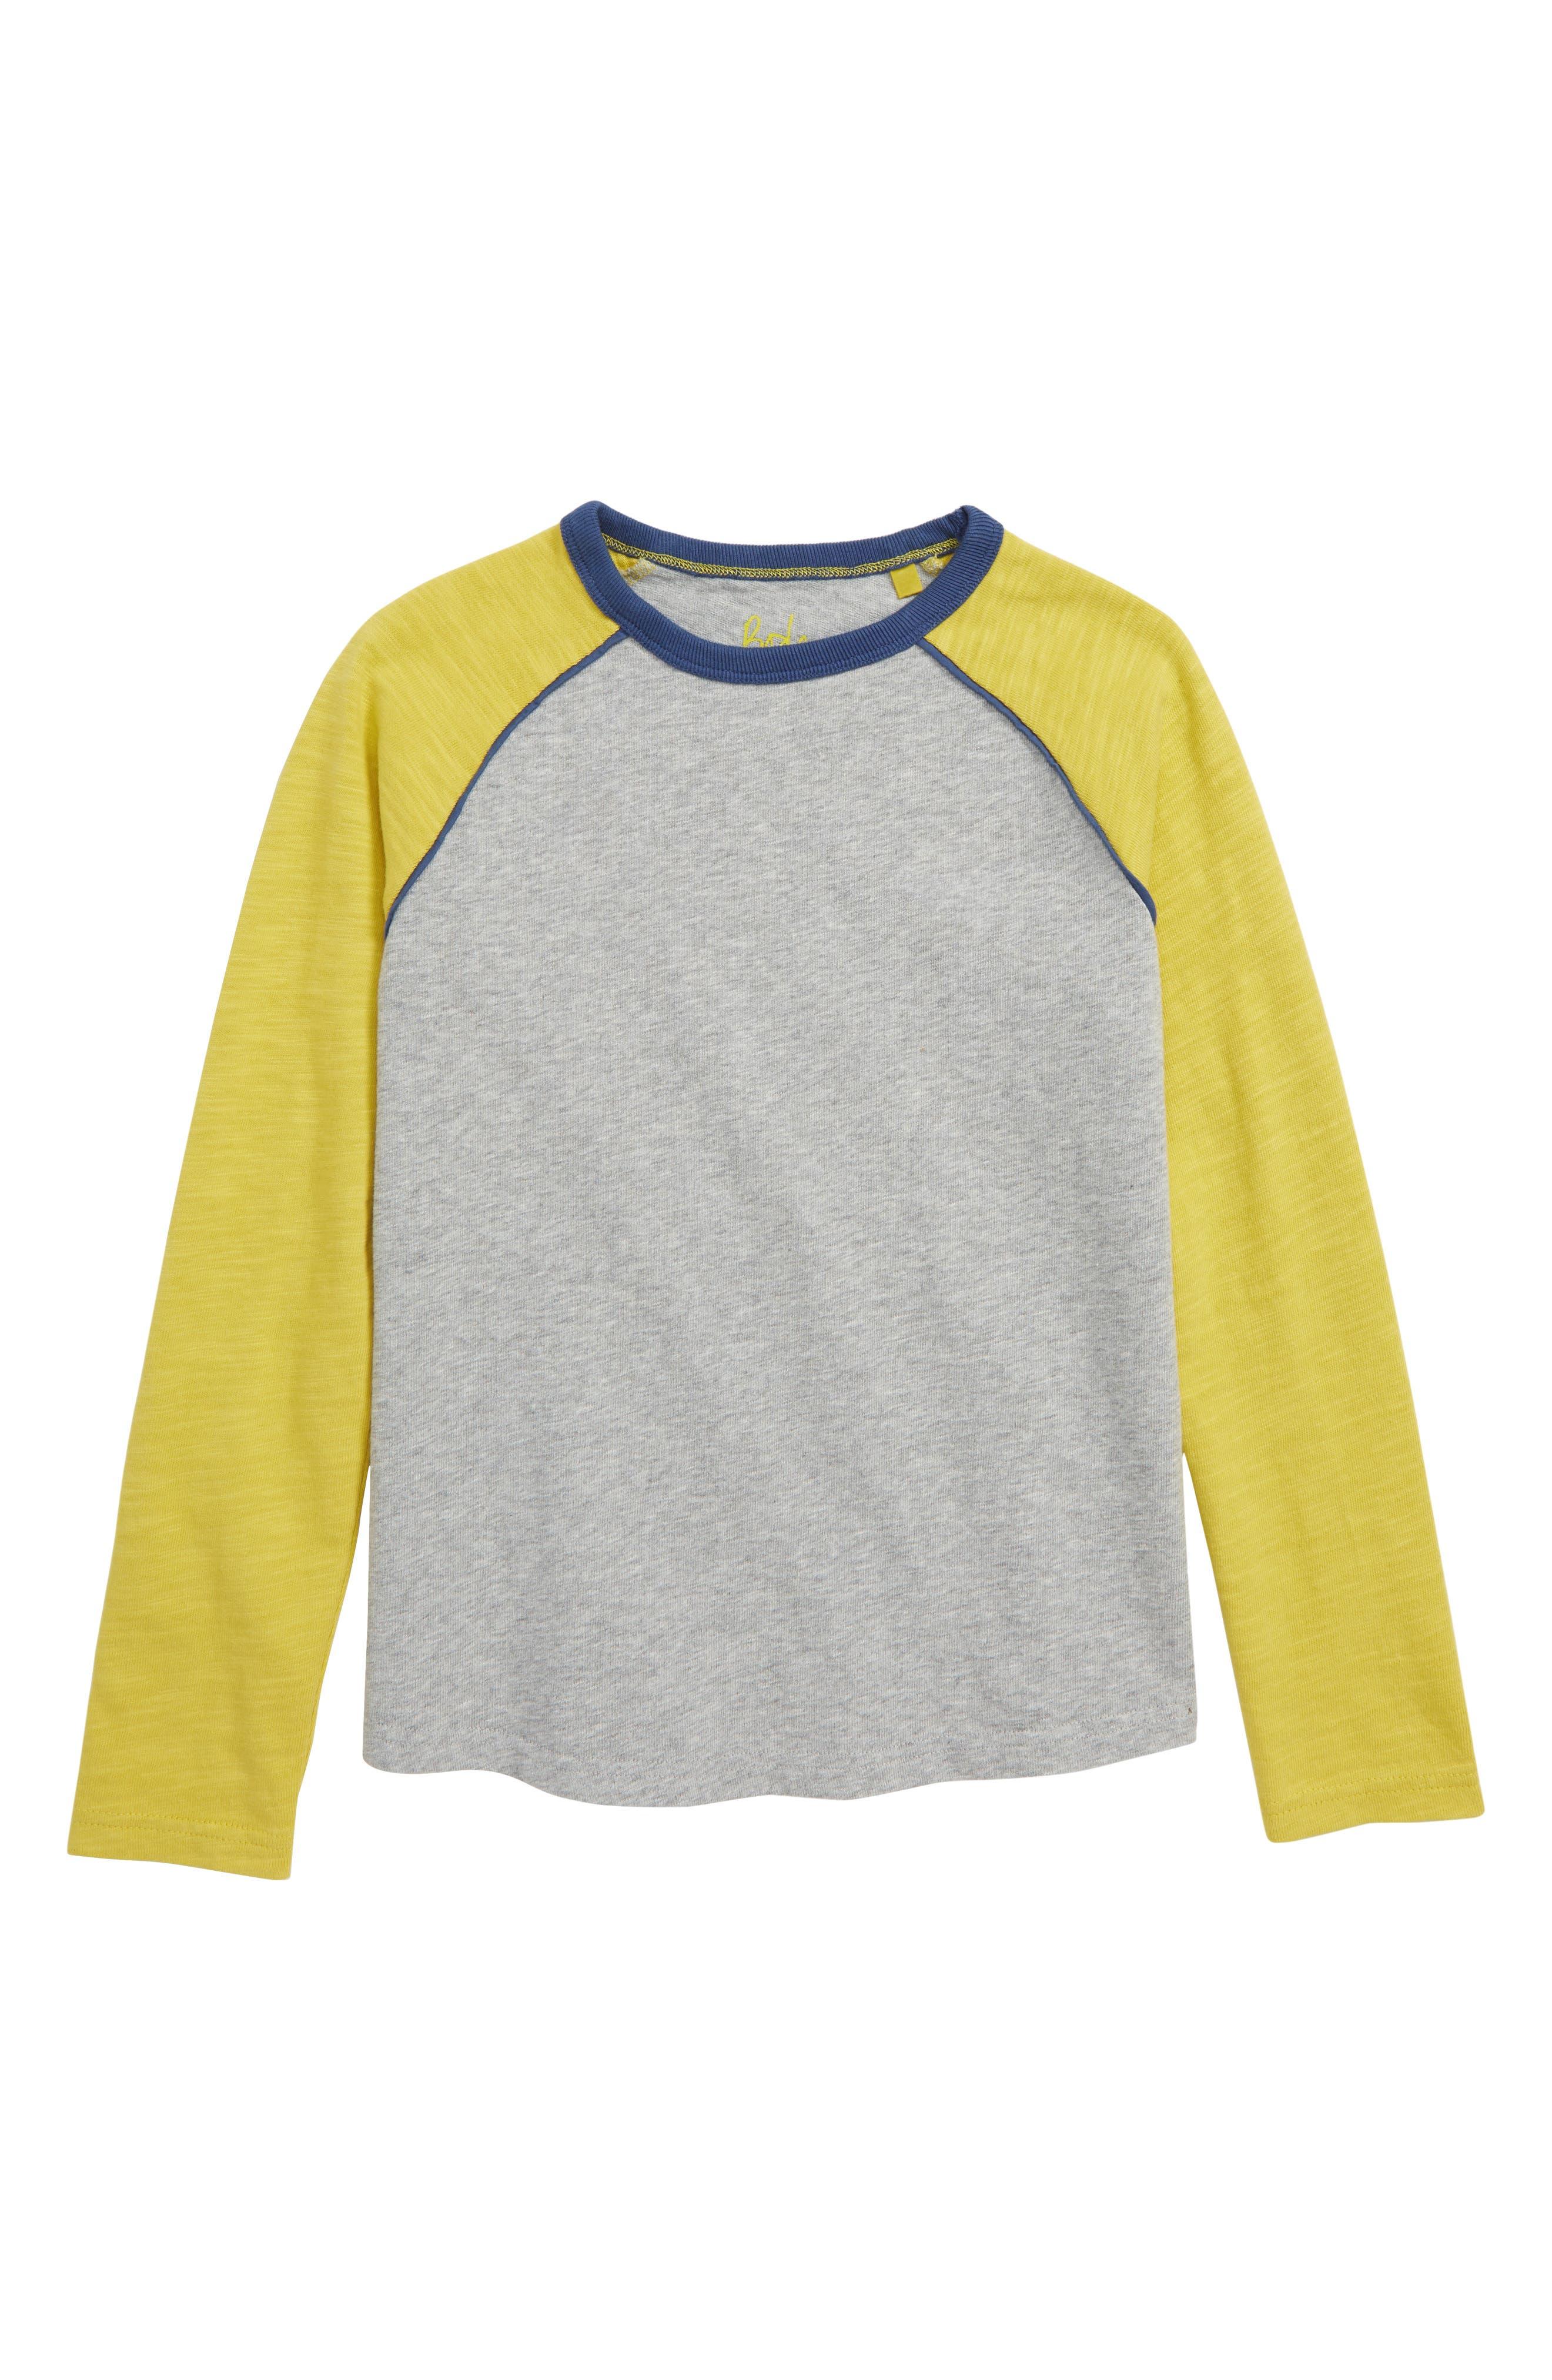 Raglan T-Shirt,                             Main thumbnail 1, color,                             GREY MARL/ CELERY YELLOW